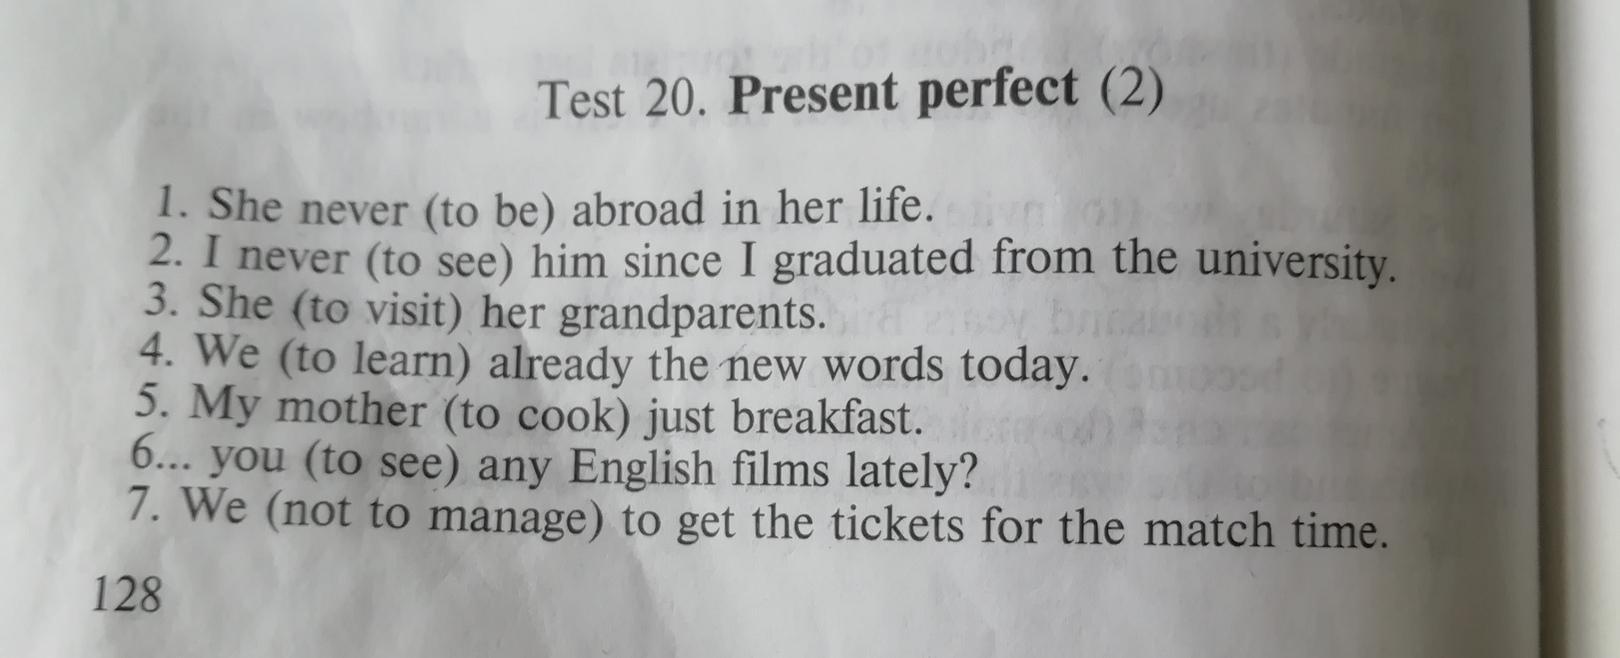 Test 20. Present perfect (2) раскрыть скобки 50